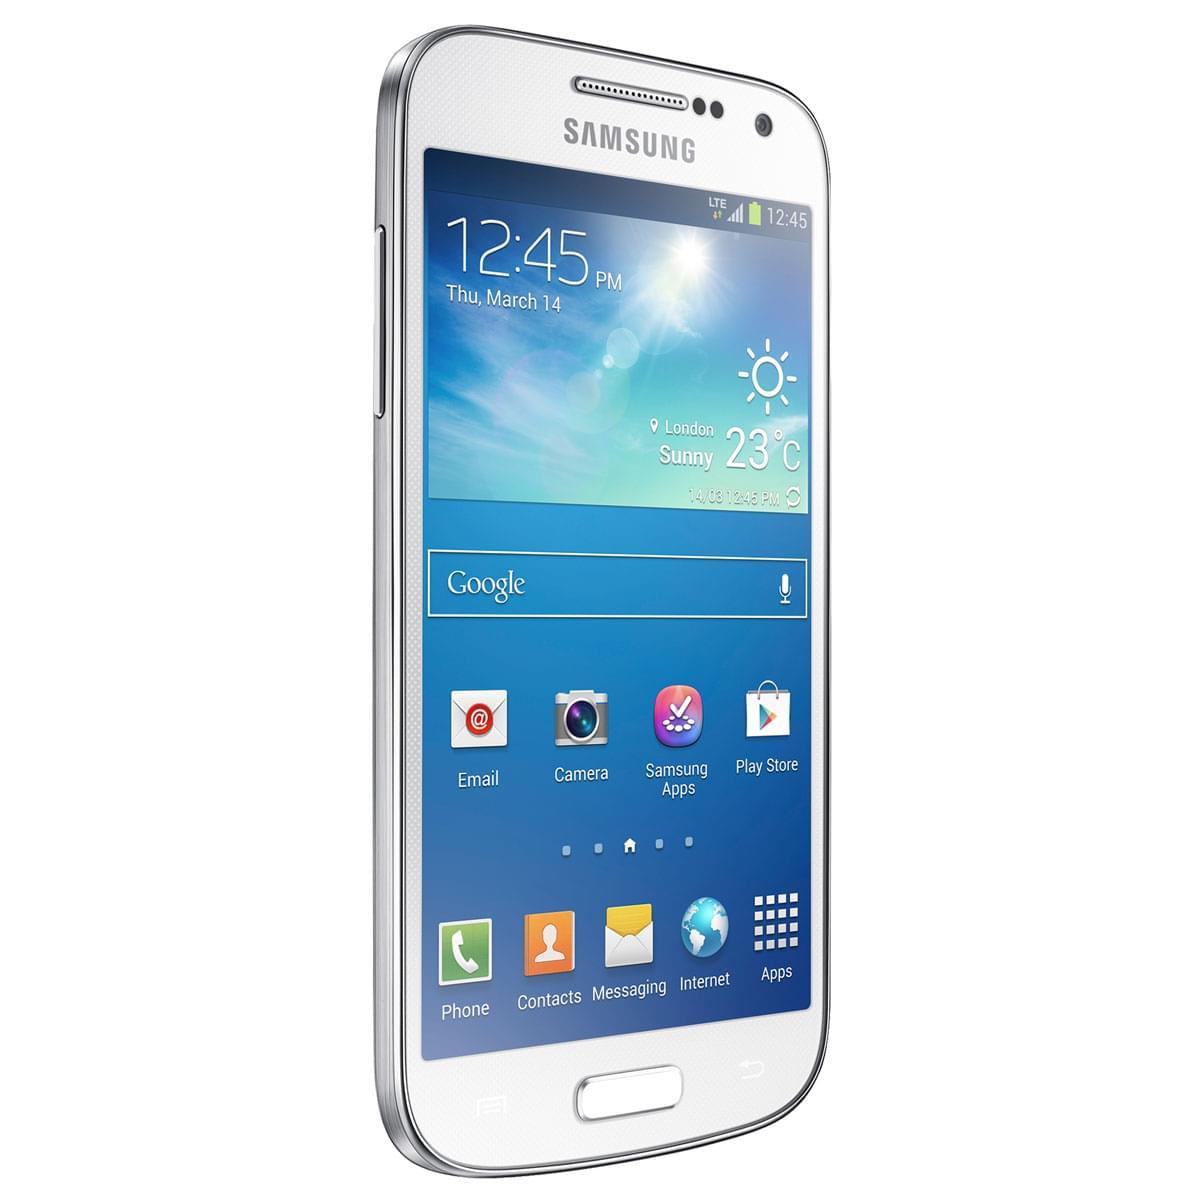 Samsung Galaxy S4 Mini 8Go Blanc GT-I9195 White (GT-I9195ZWAXEF) - Achat / Vente Téléphonie sur Cybertek.fr - 0